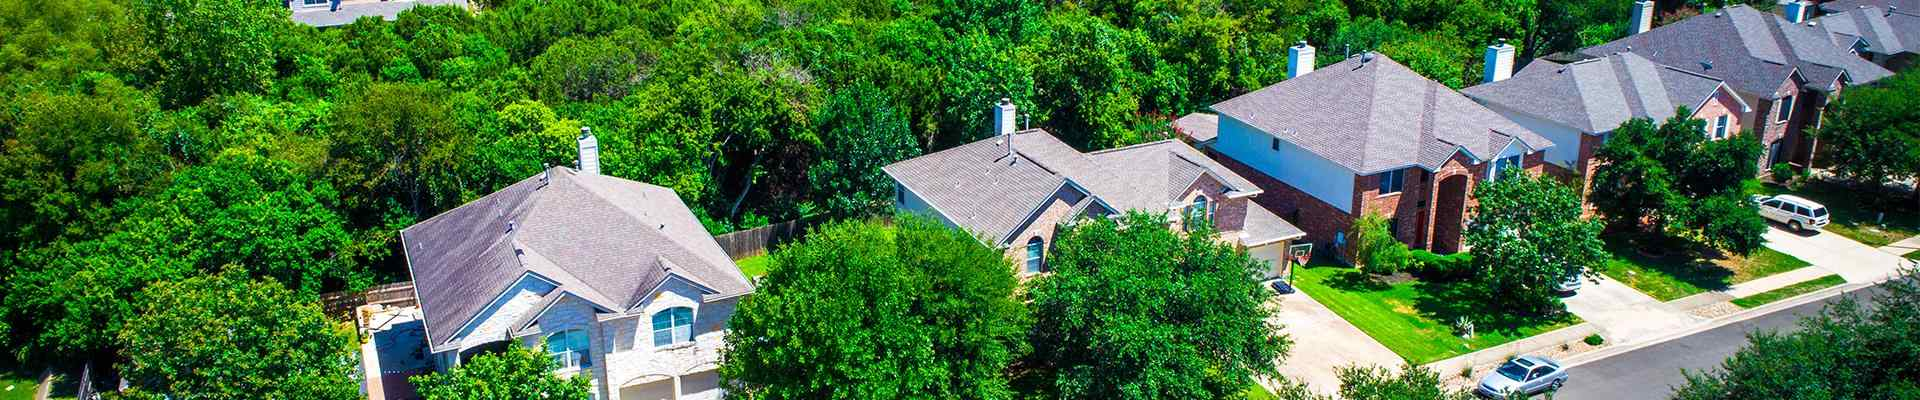 a suburban neighborhood in hickory creek texas